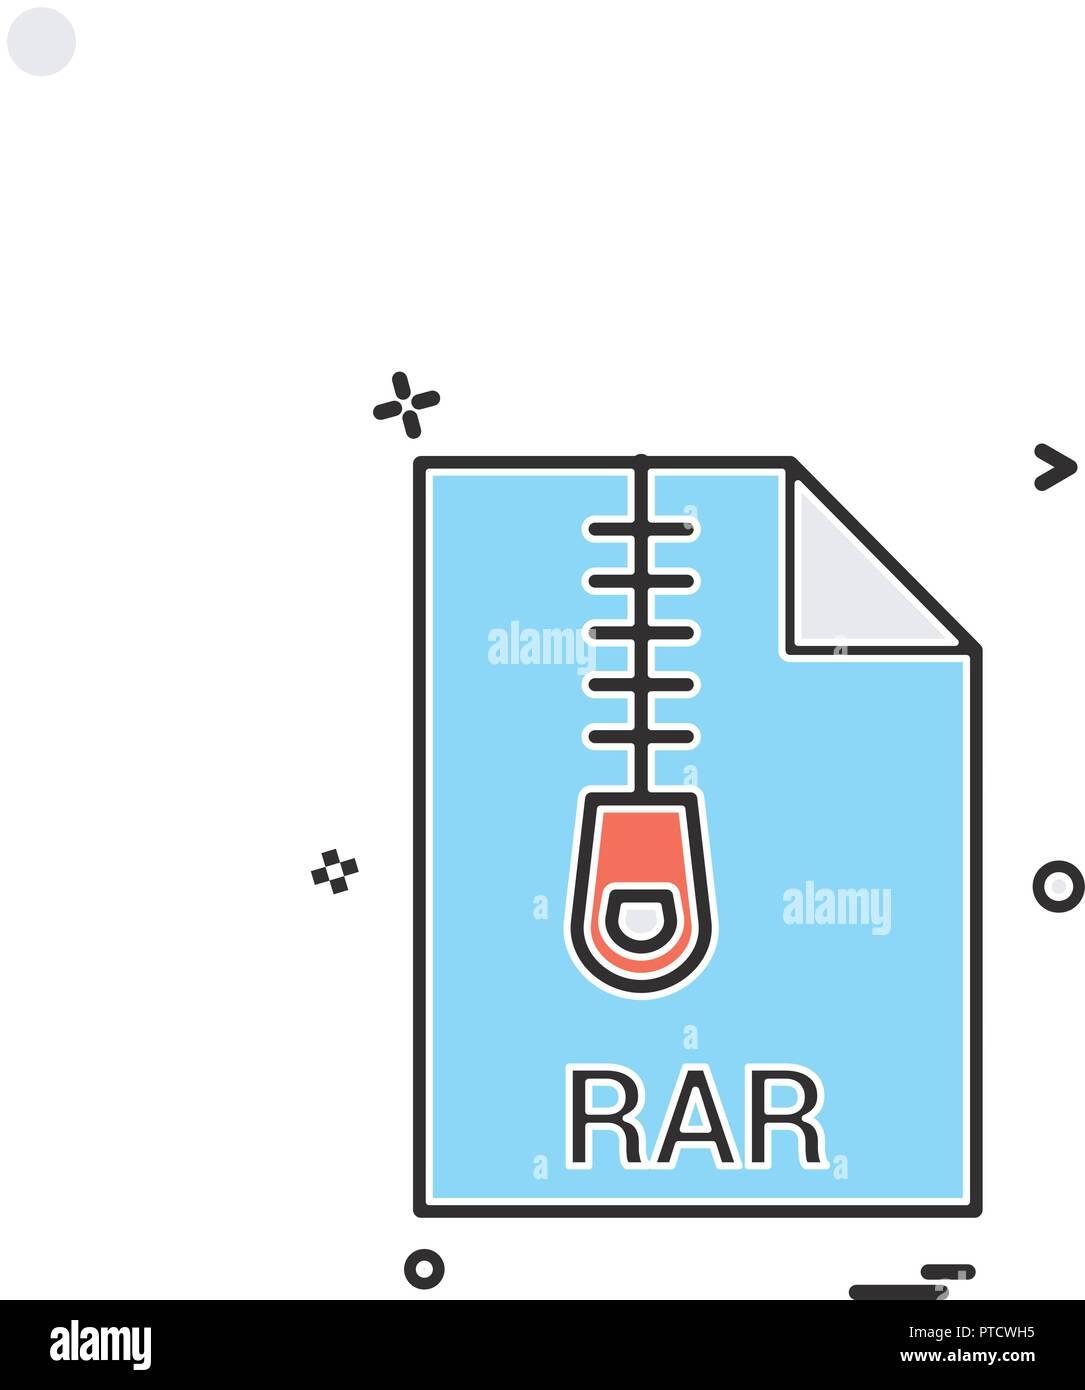 Rar file extension